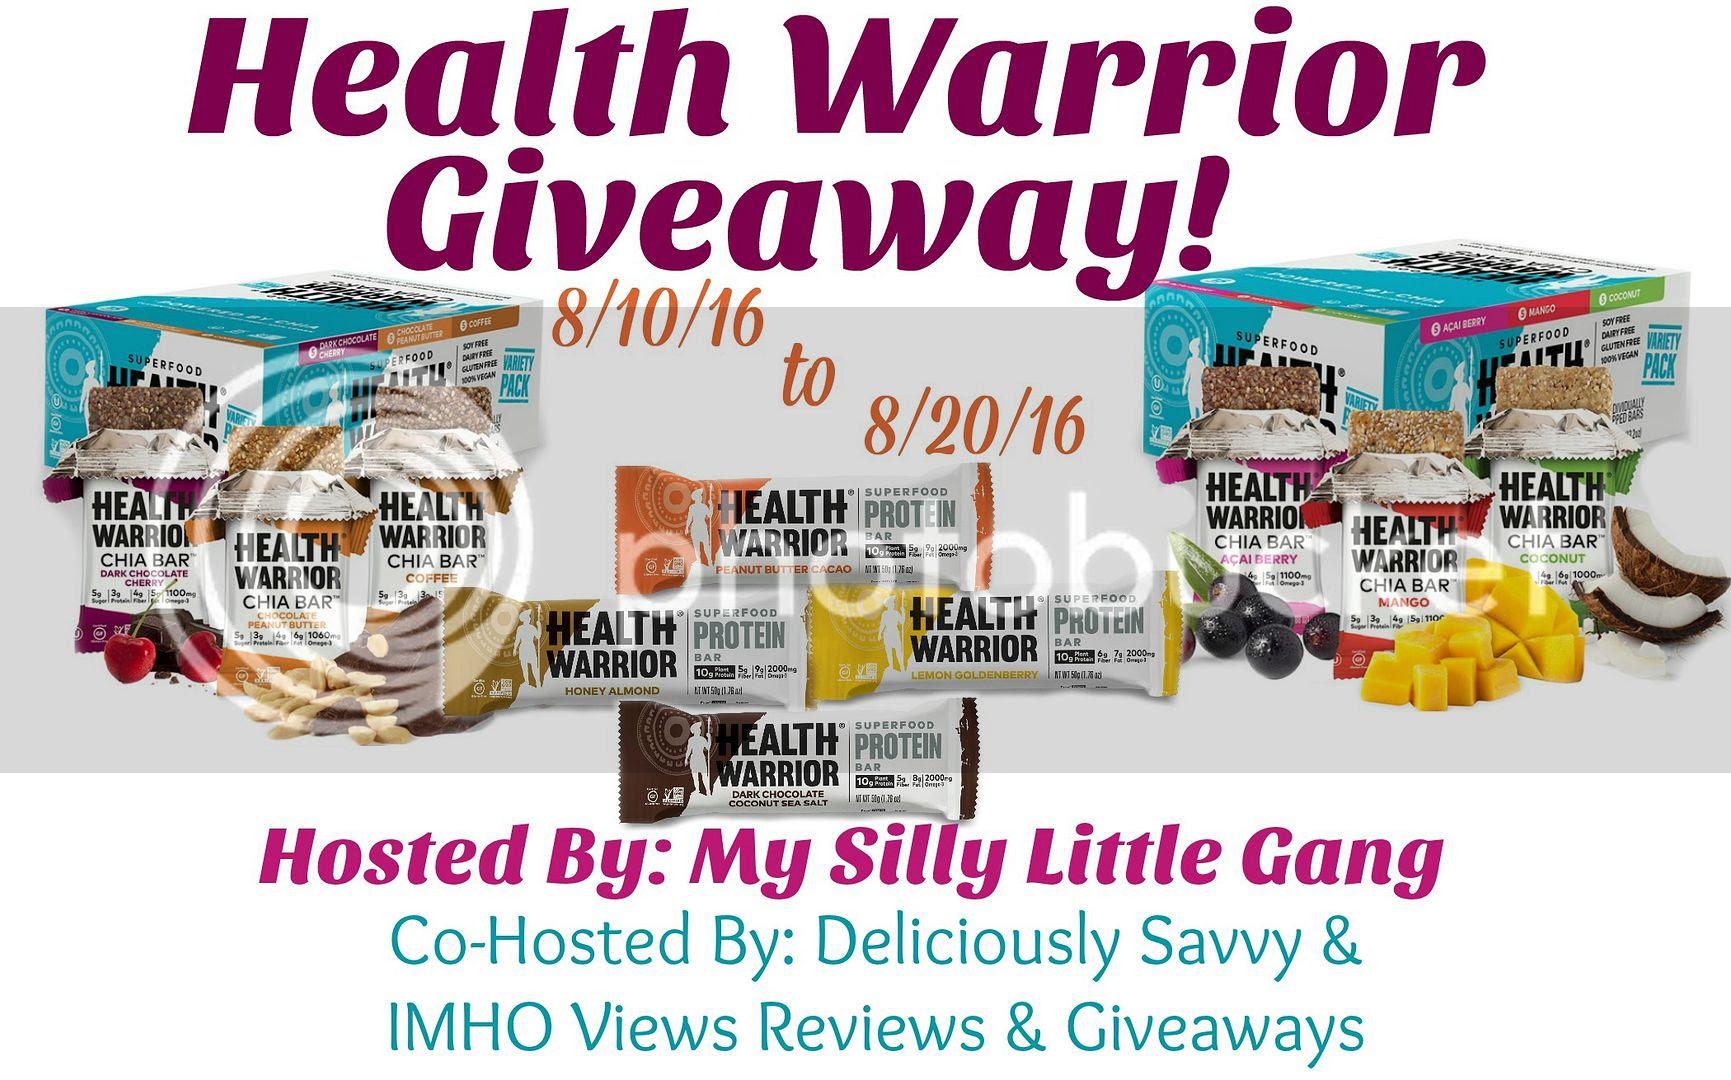 Health Warrior Bars Giveaway